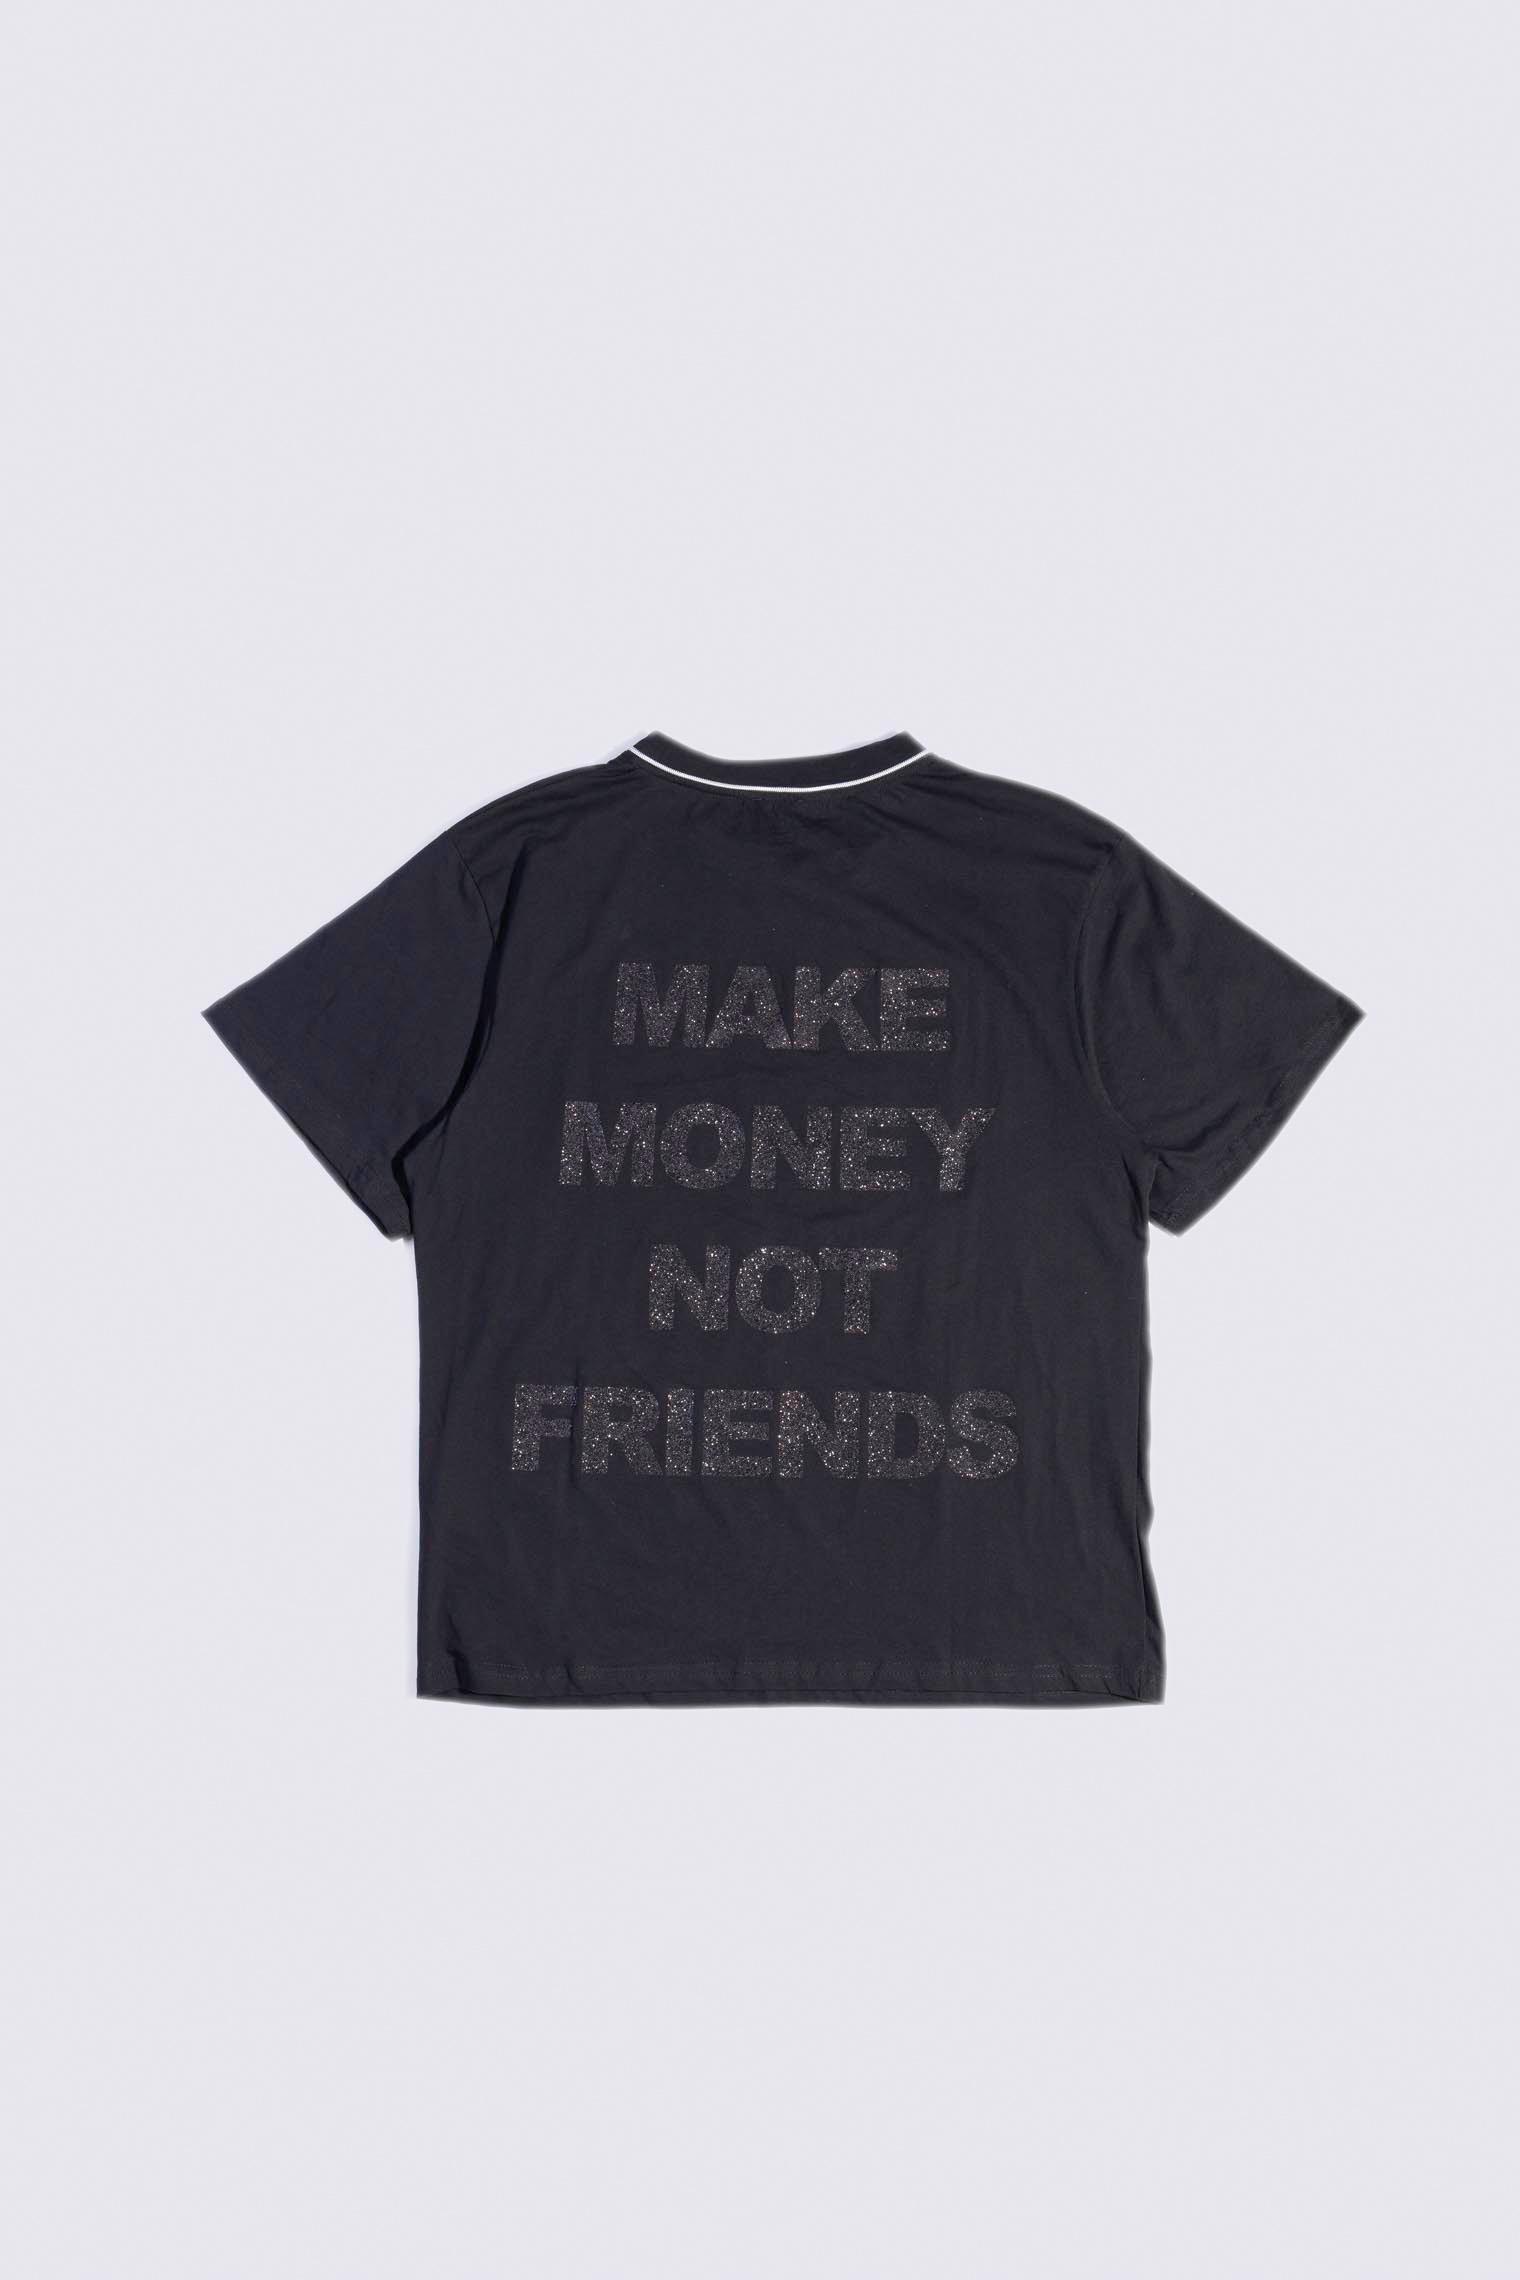 MAKE MONEY NOT FRIENDS T-SHIRT CERNIERA NERO/NERO AE2